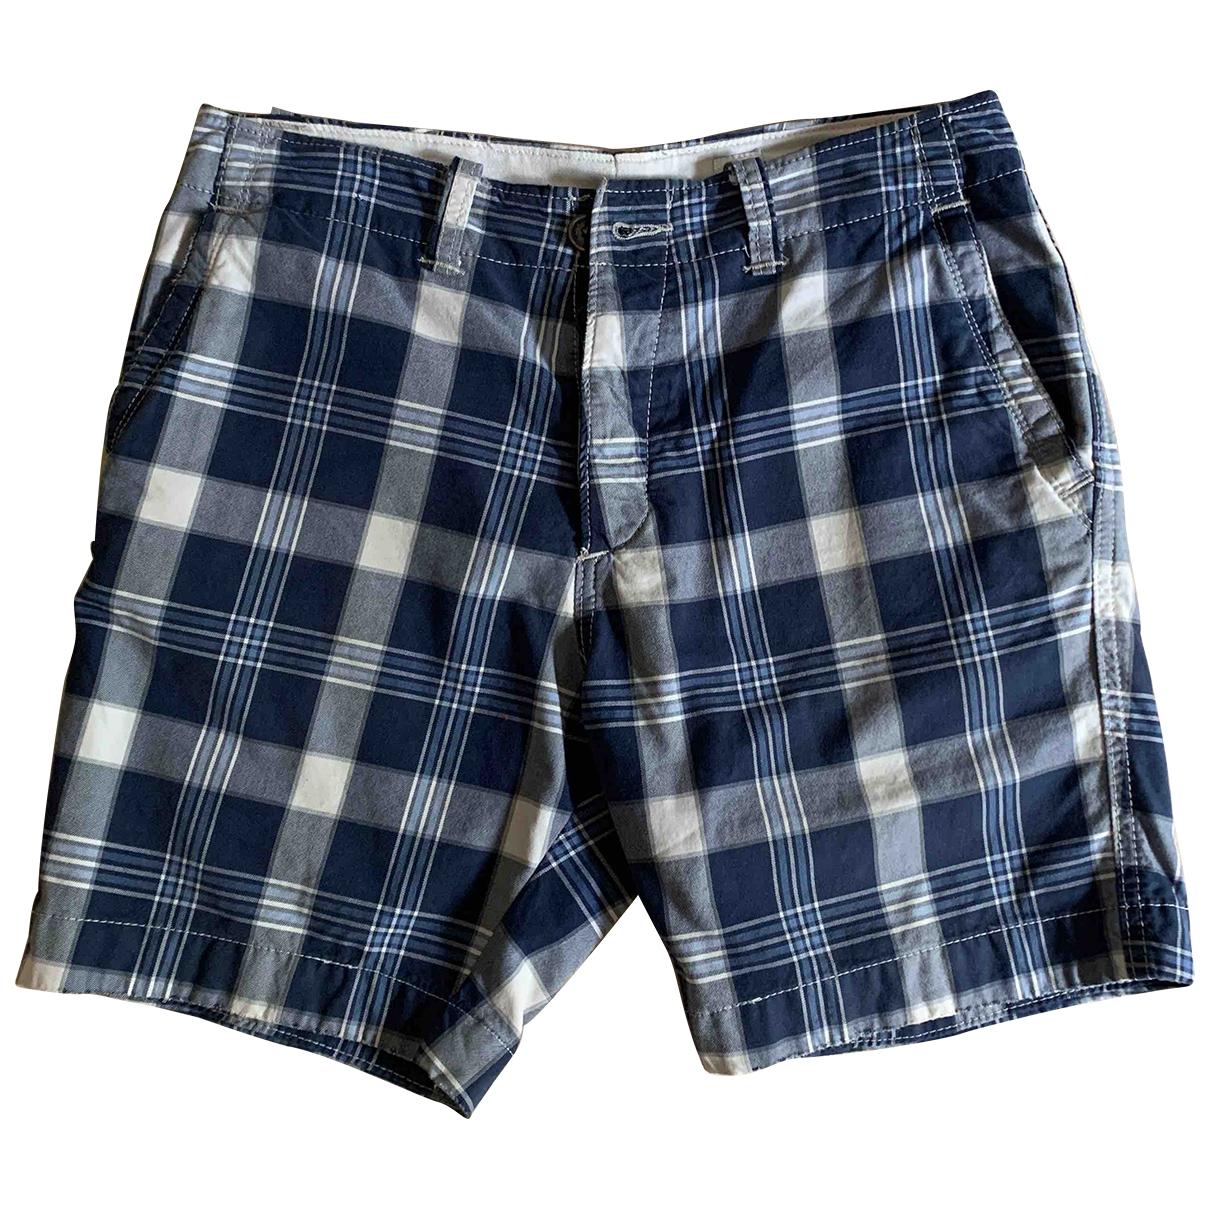 Pantalon corto Abercrombie & Fitch